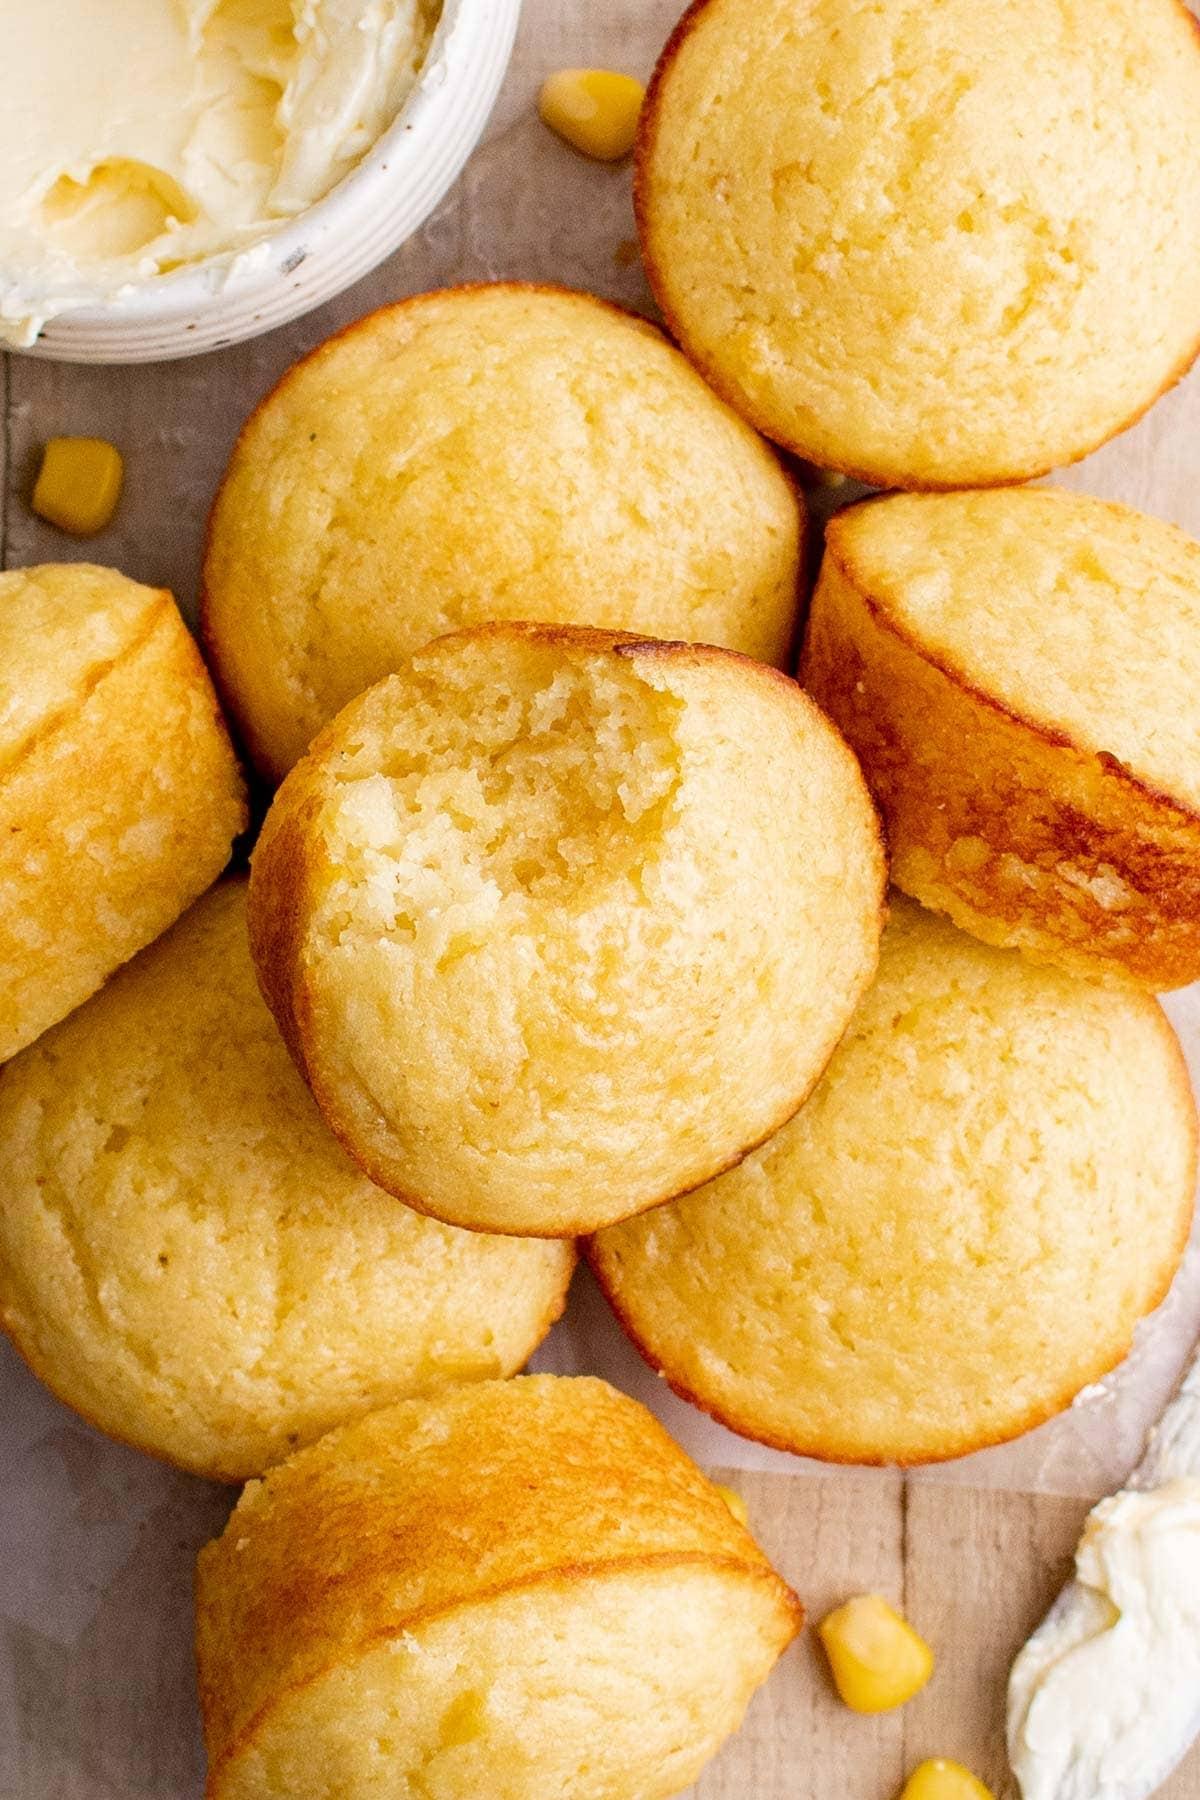 cornbread muffins - one has a bit taken out